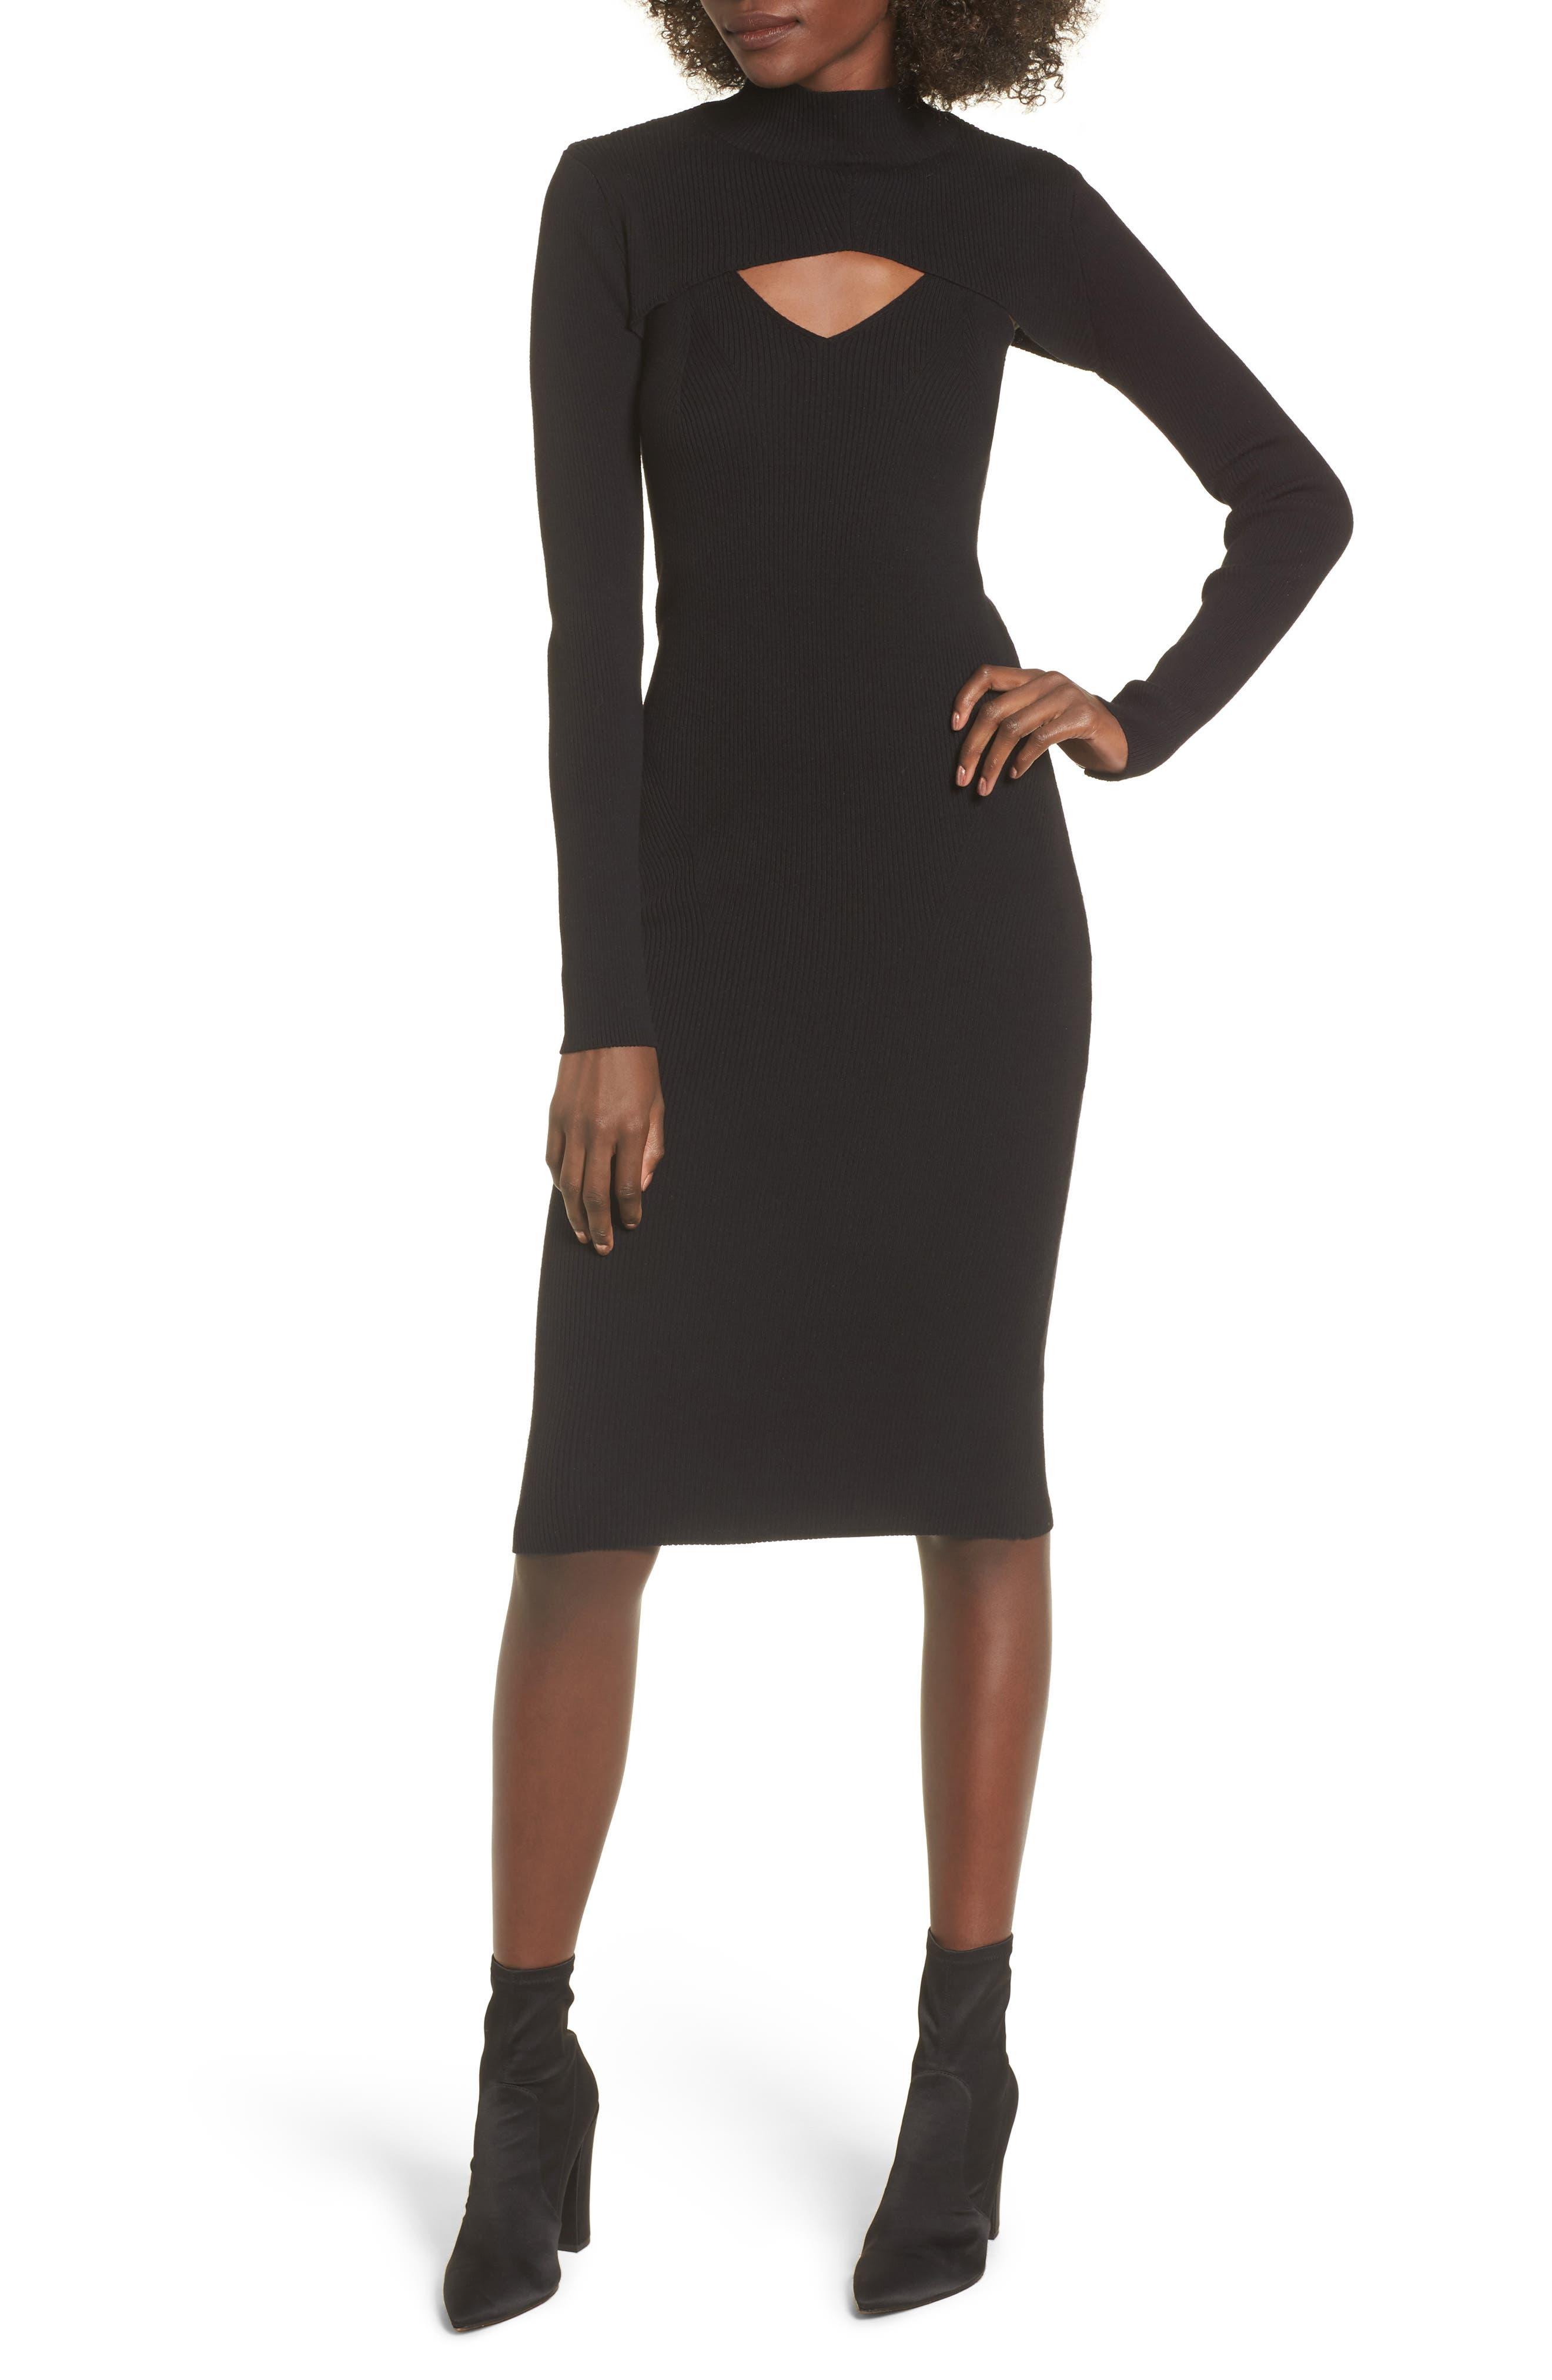 Slipdress with Shrug Sweater,                             Main thumbnail 1, color,                             Black